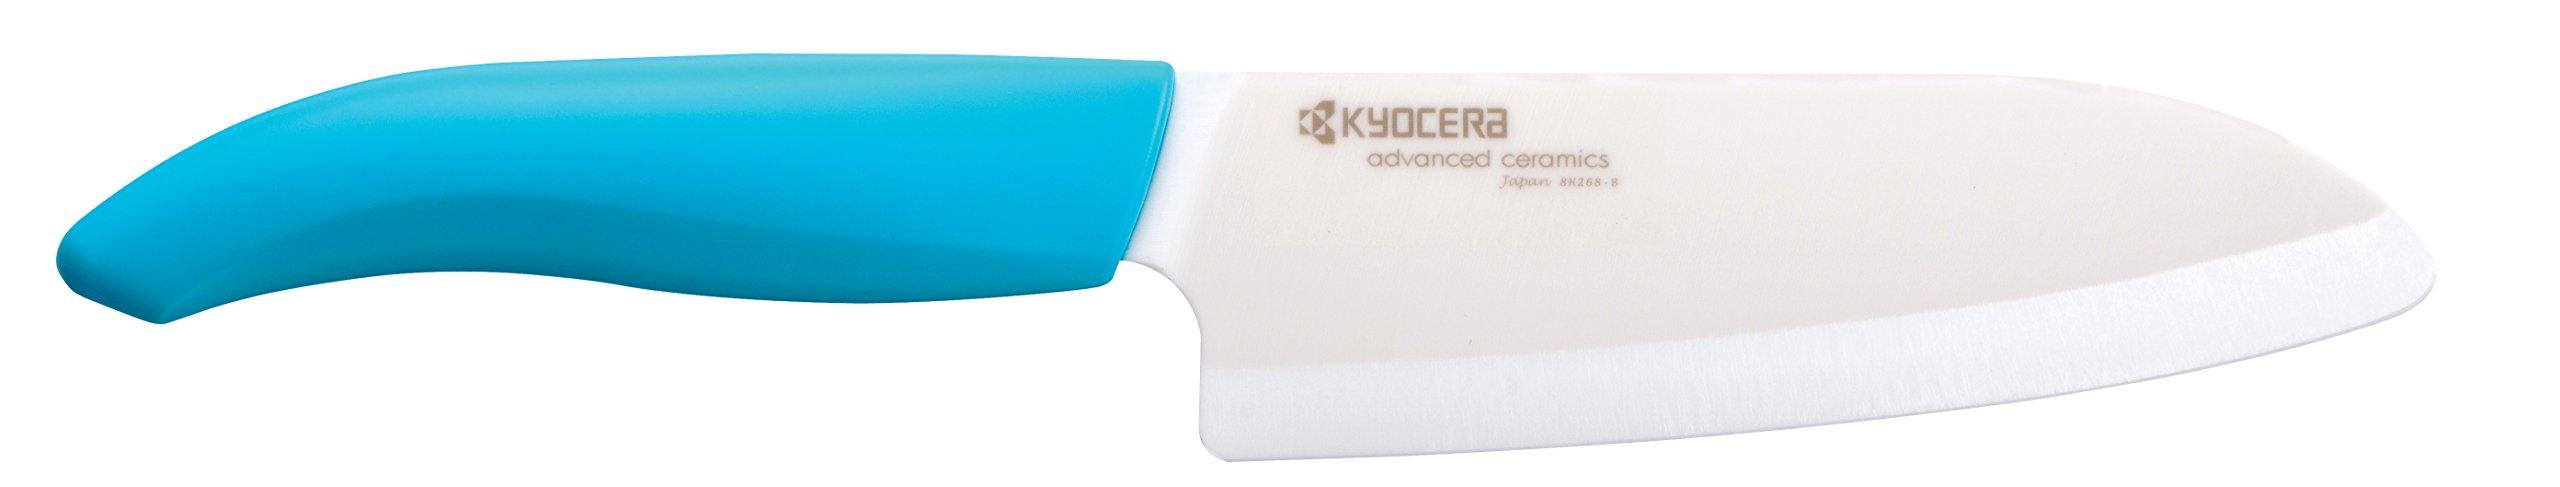 Kyocera Advanced Ceramic Revolution Series 5-1/2-inch Santoku Knife, Blue Handle, White Blade